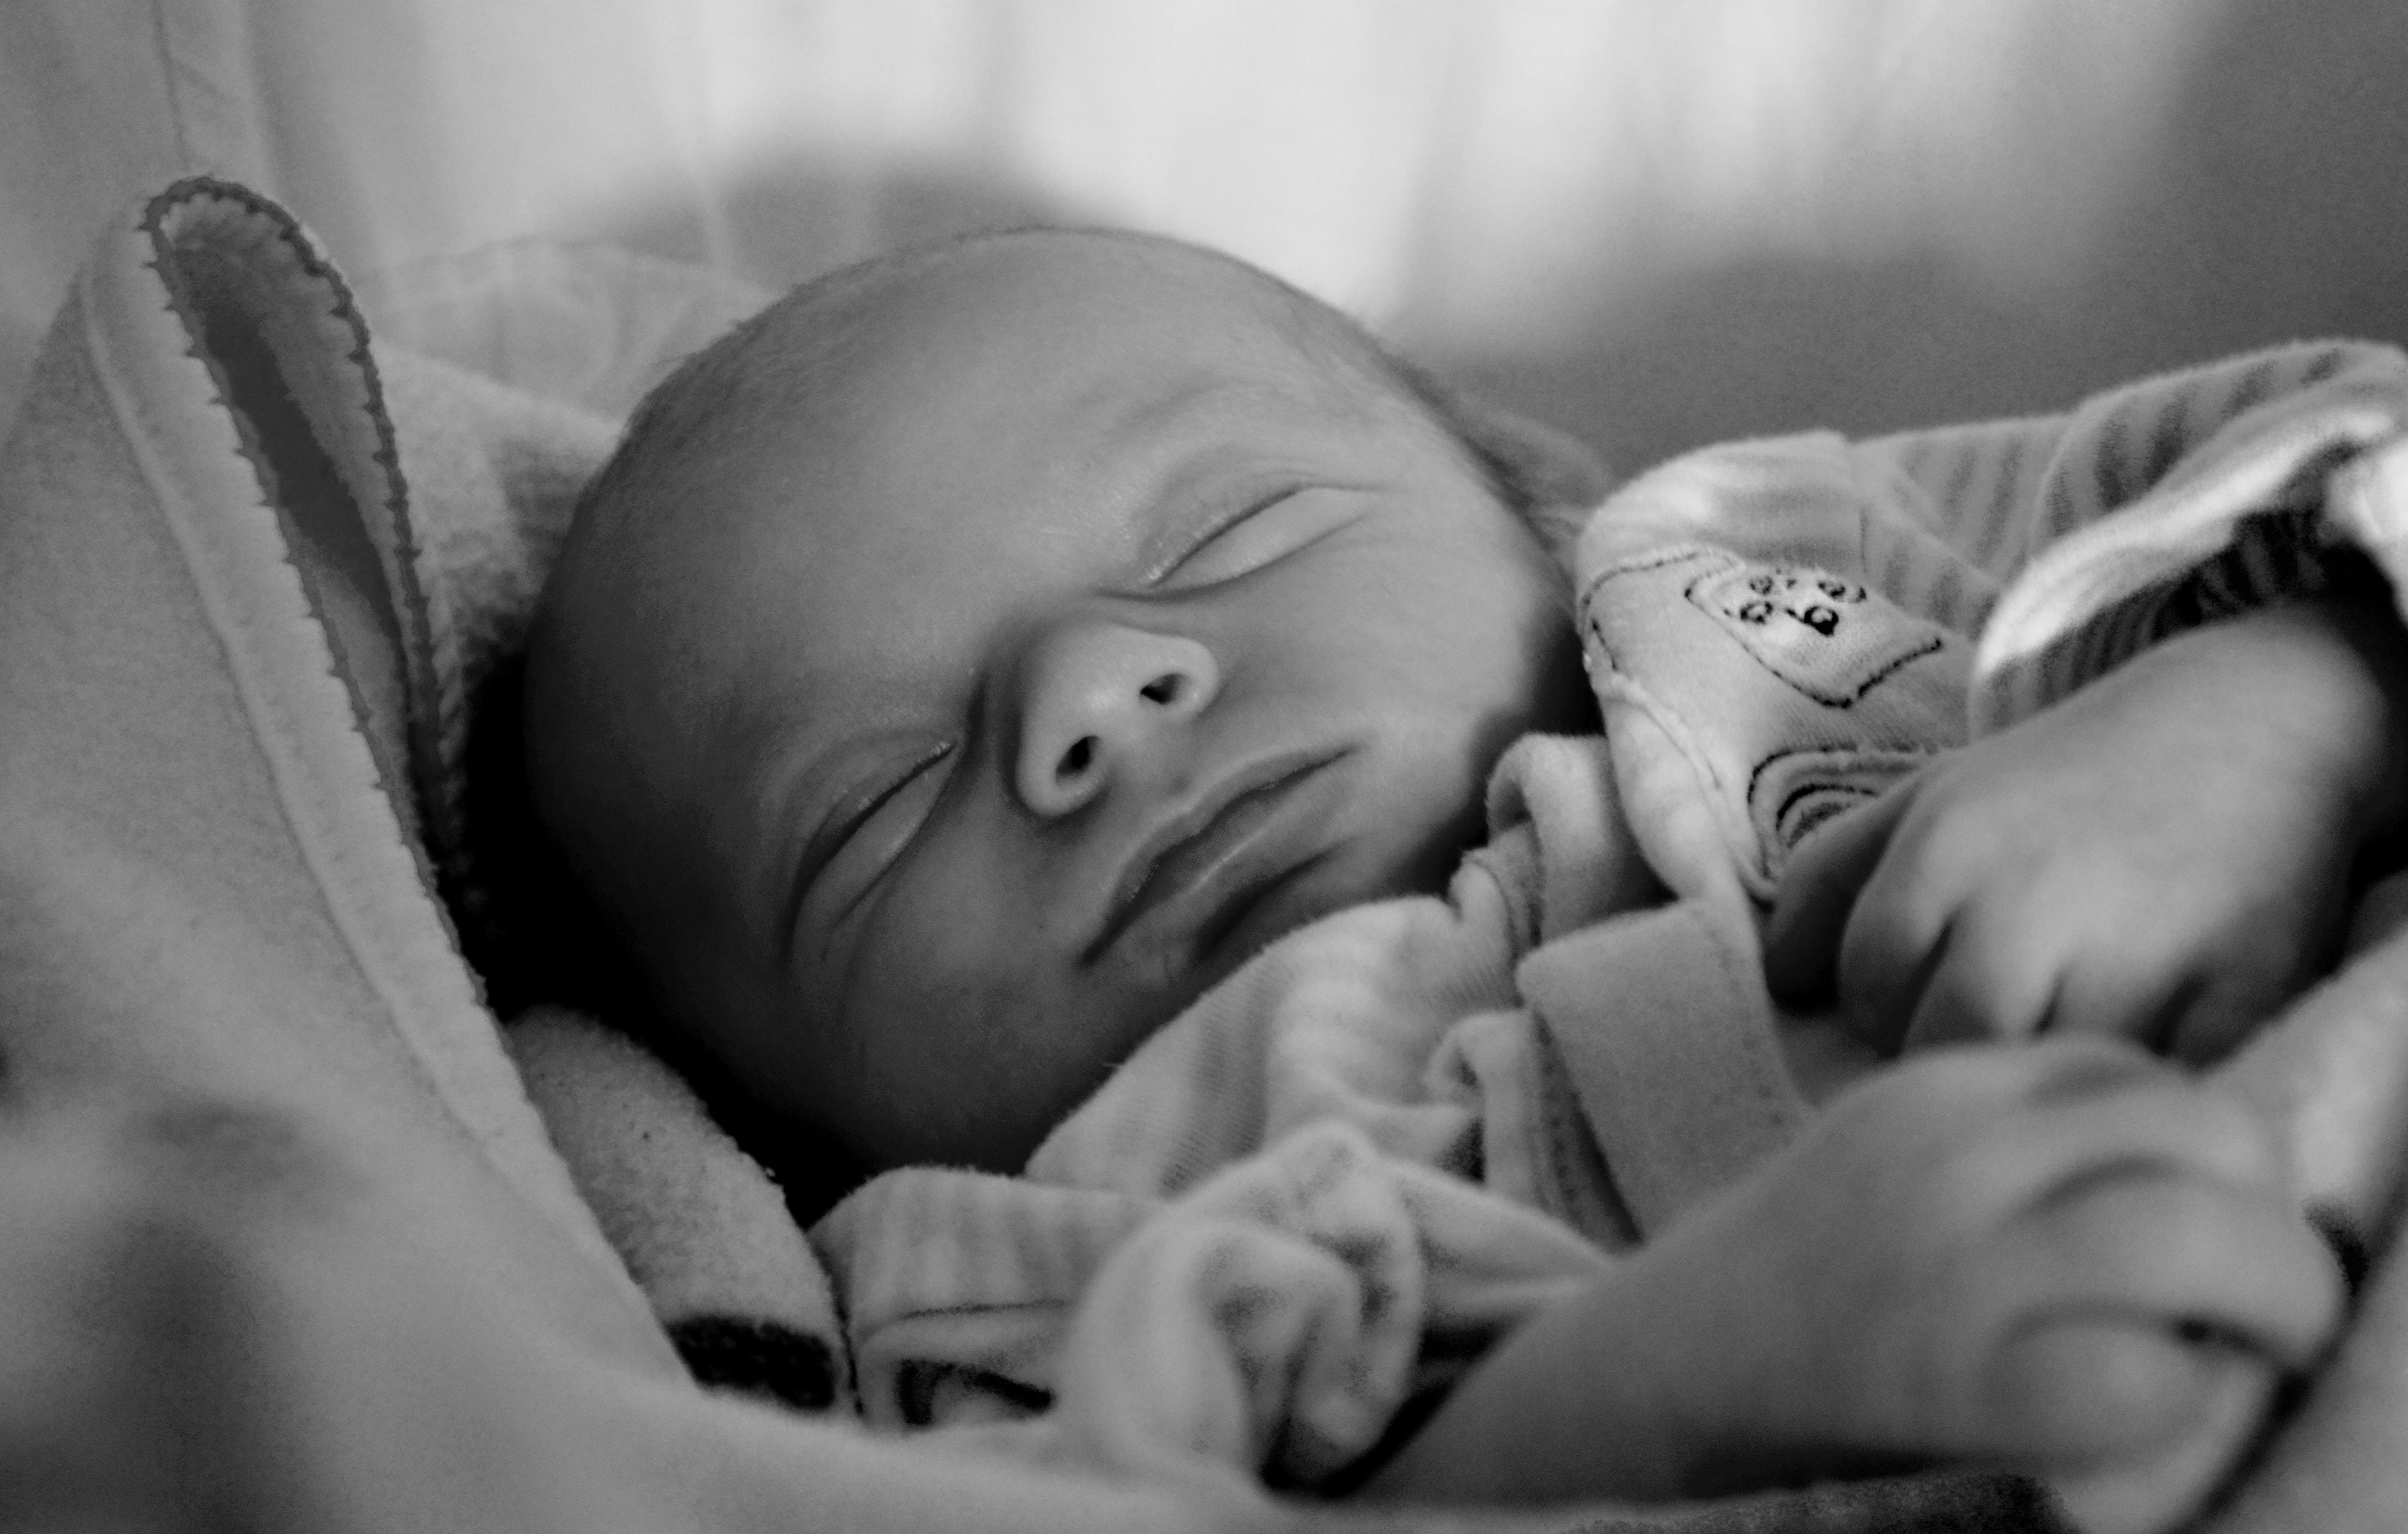 grayscale photography of baby sleeping 183 free stock photo